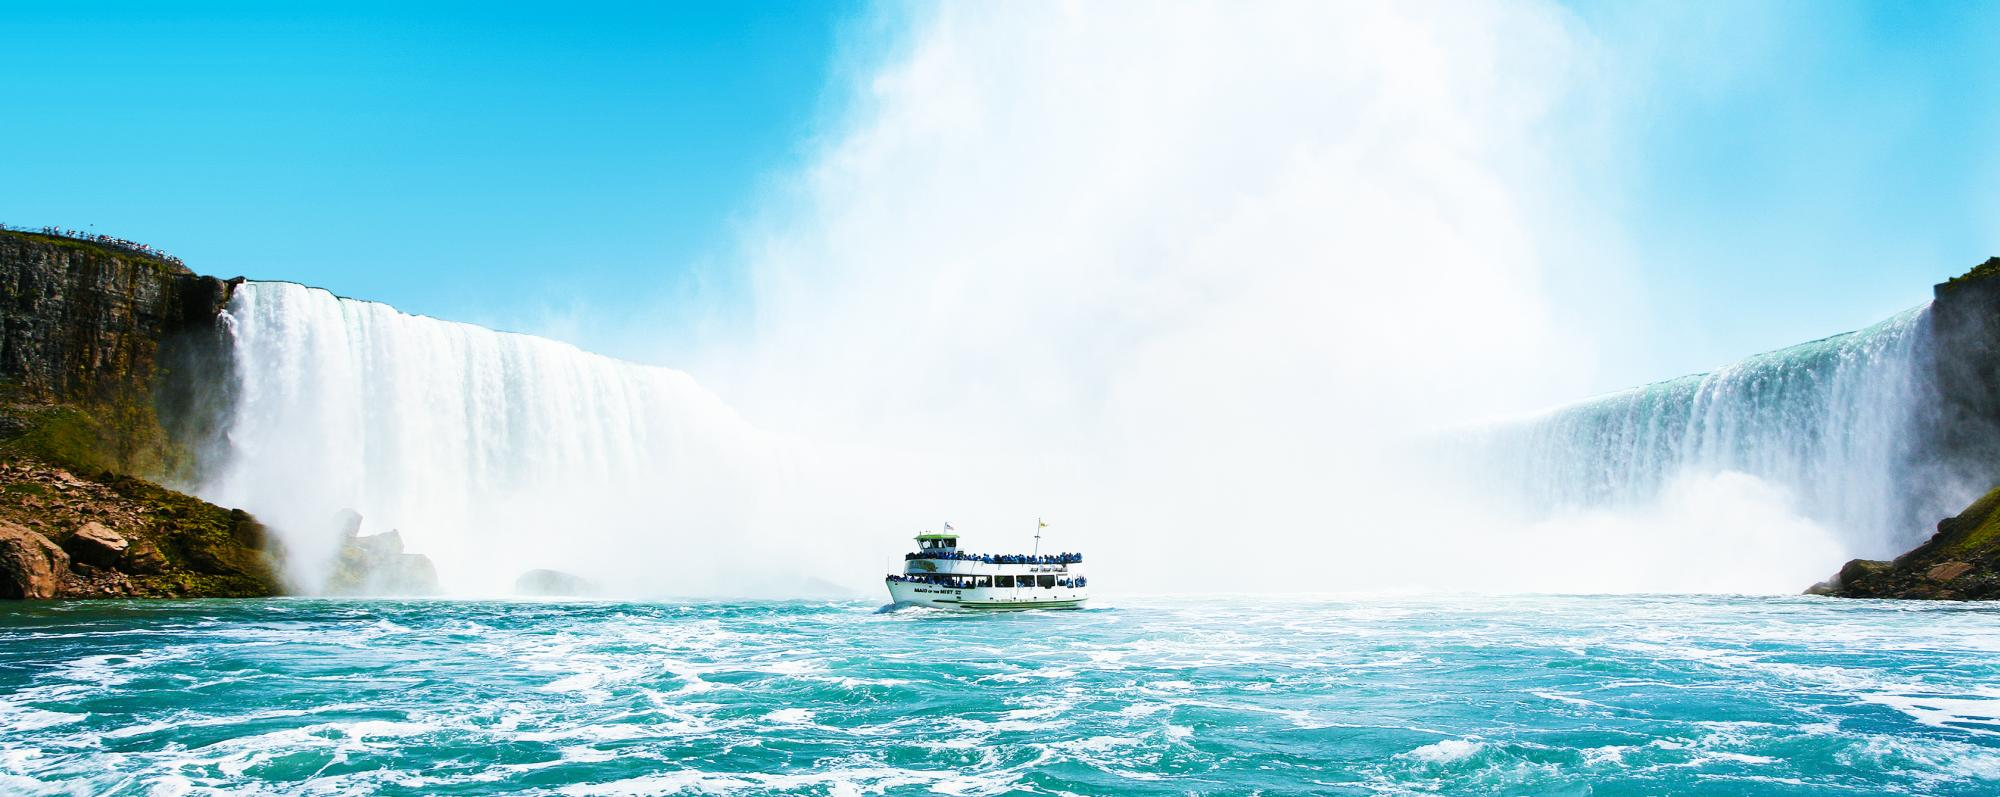 Maid of the mist entering near Niagara falls